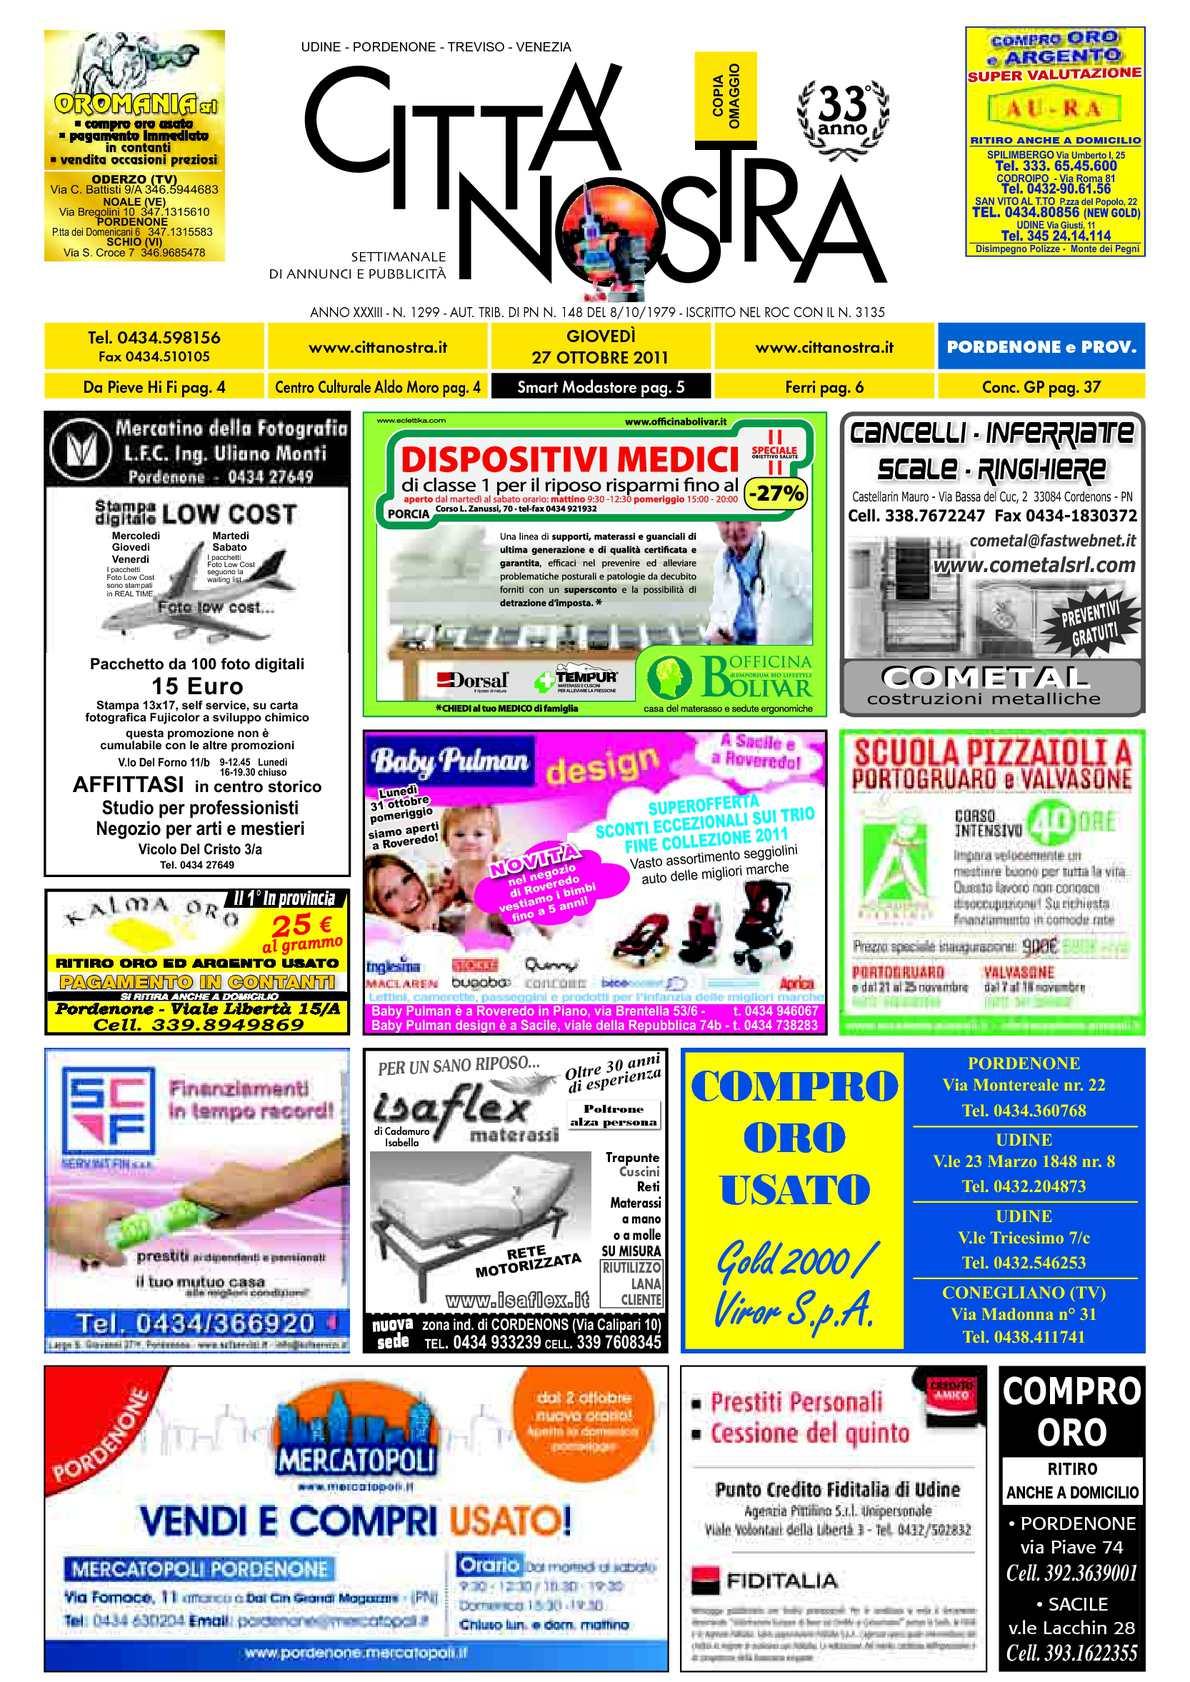 N1299 10 2011 Nostra Pordenone 27 Del Calamᄄᆭo Cittᄄᄂ ED2beYWH9I